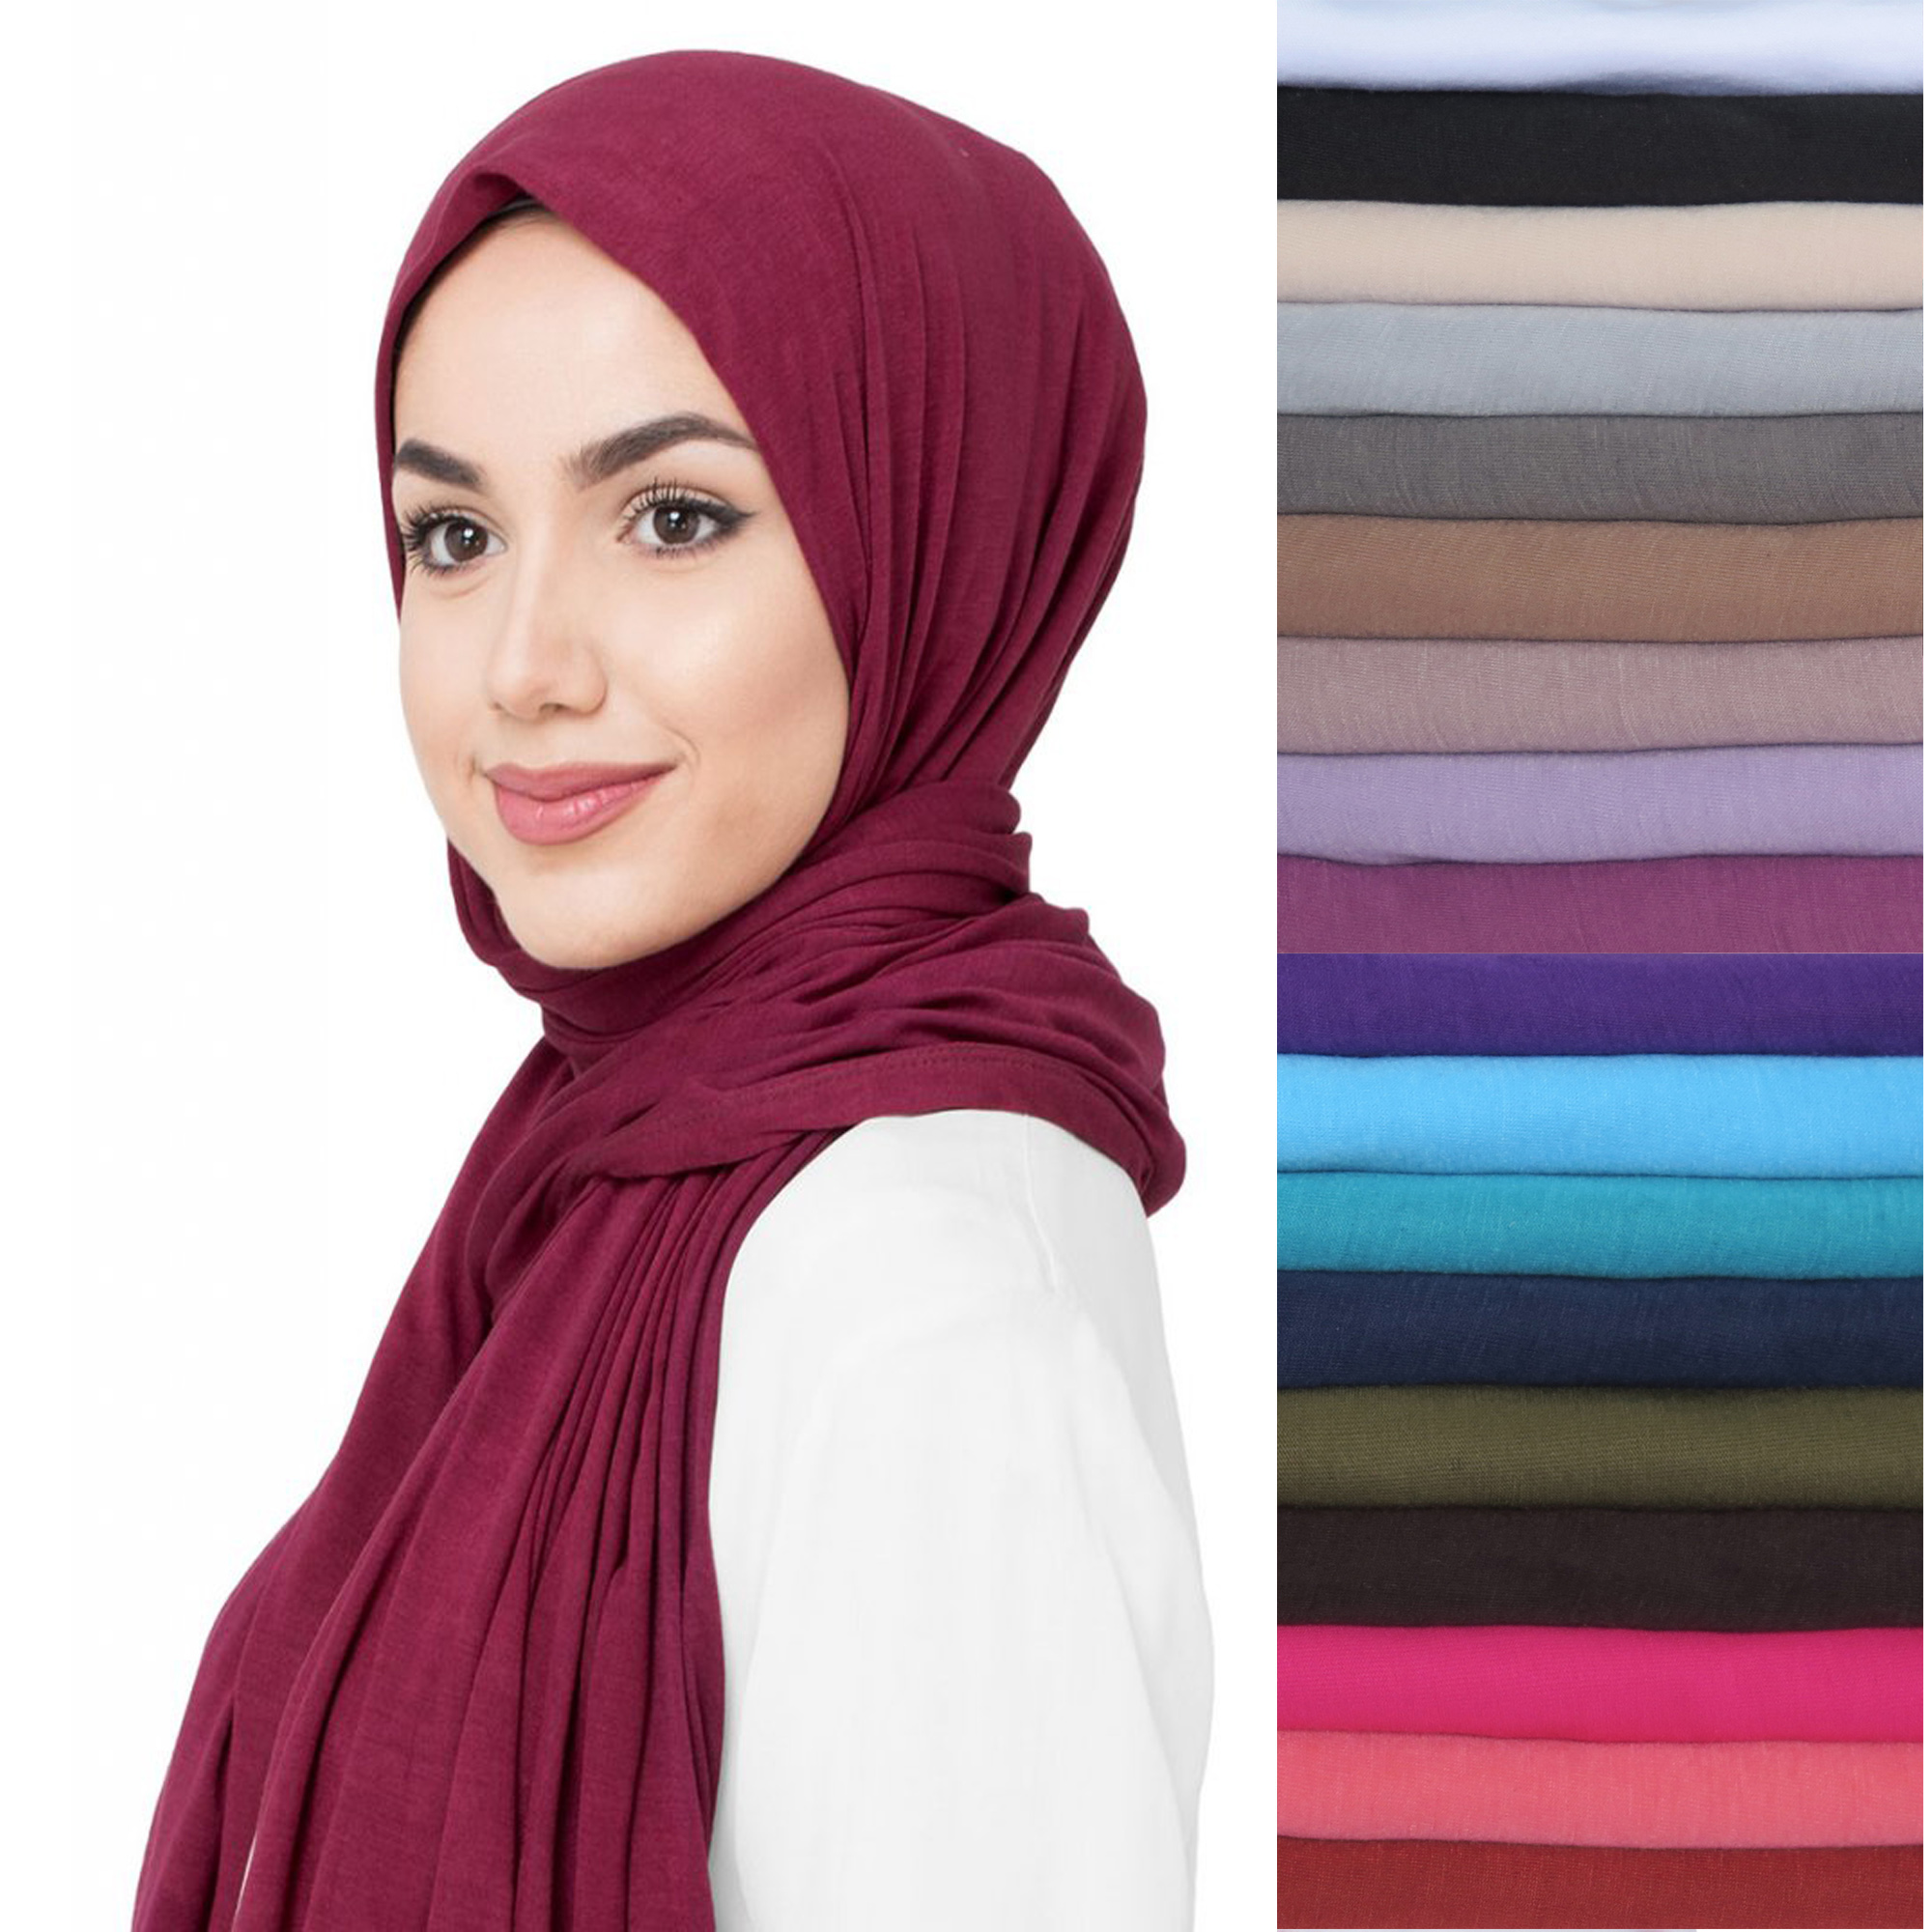 10pcs/lot Premium Jersey Stretchy Fabric Muslim Hijab Head Scarf Shawl Wrap Turban Solid Colors